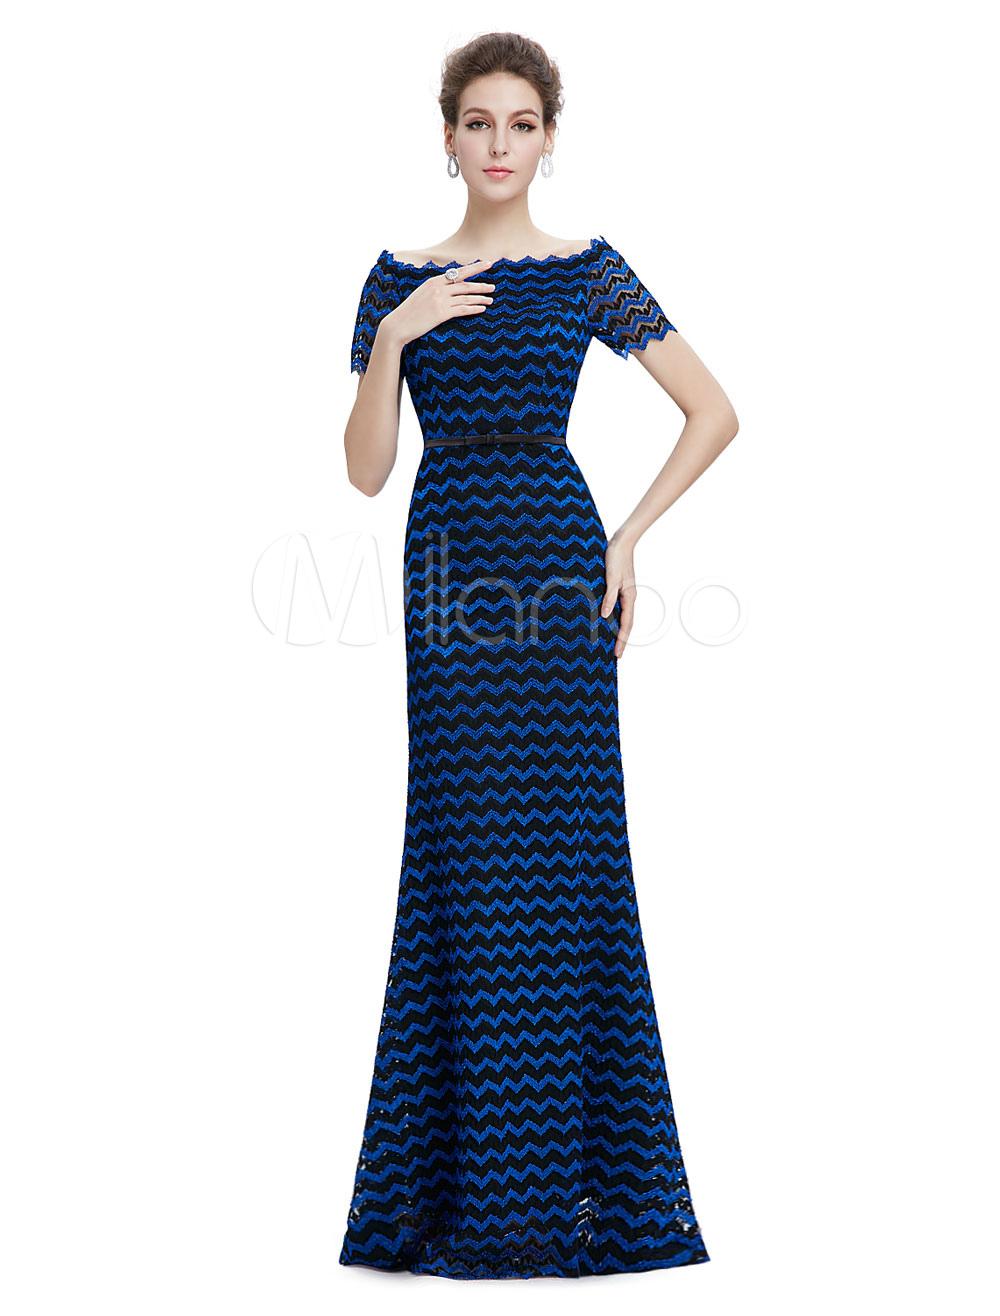 Mermaid Mother Of The Bride Dress Blue Bateau Formal Evening Dress Short Sleeve Floor Length Wedding Guest Dresses